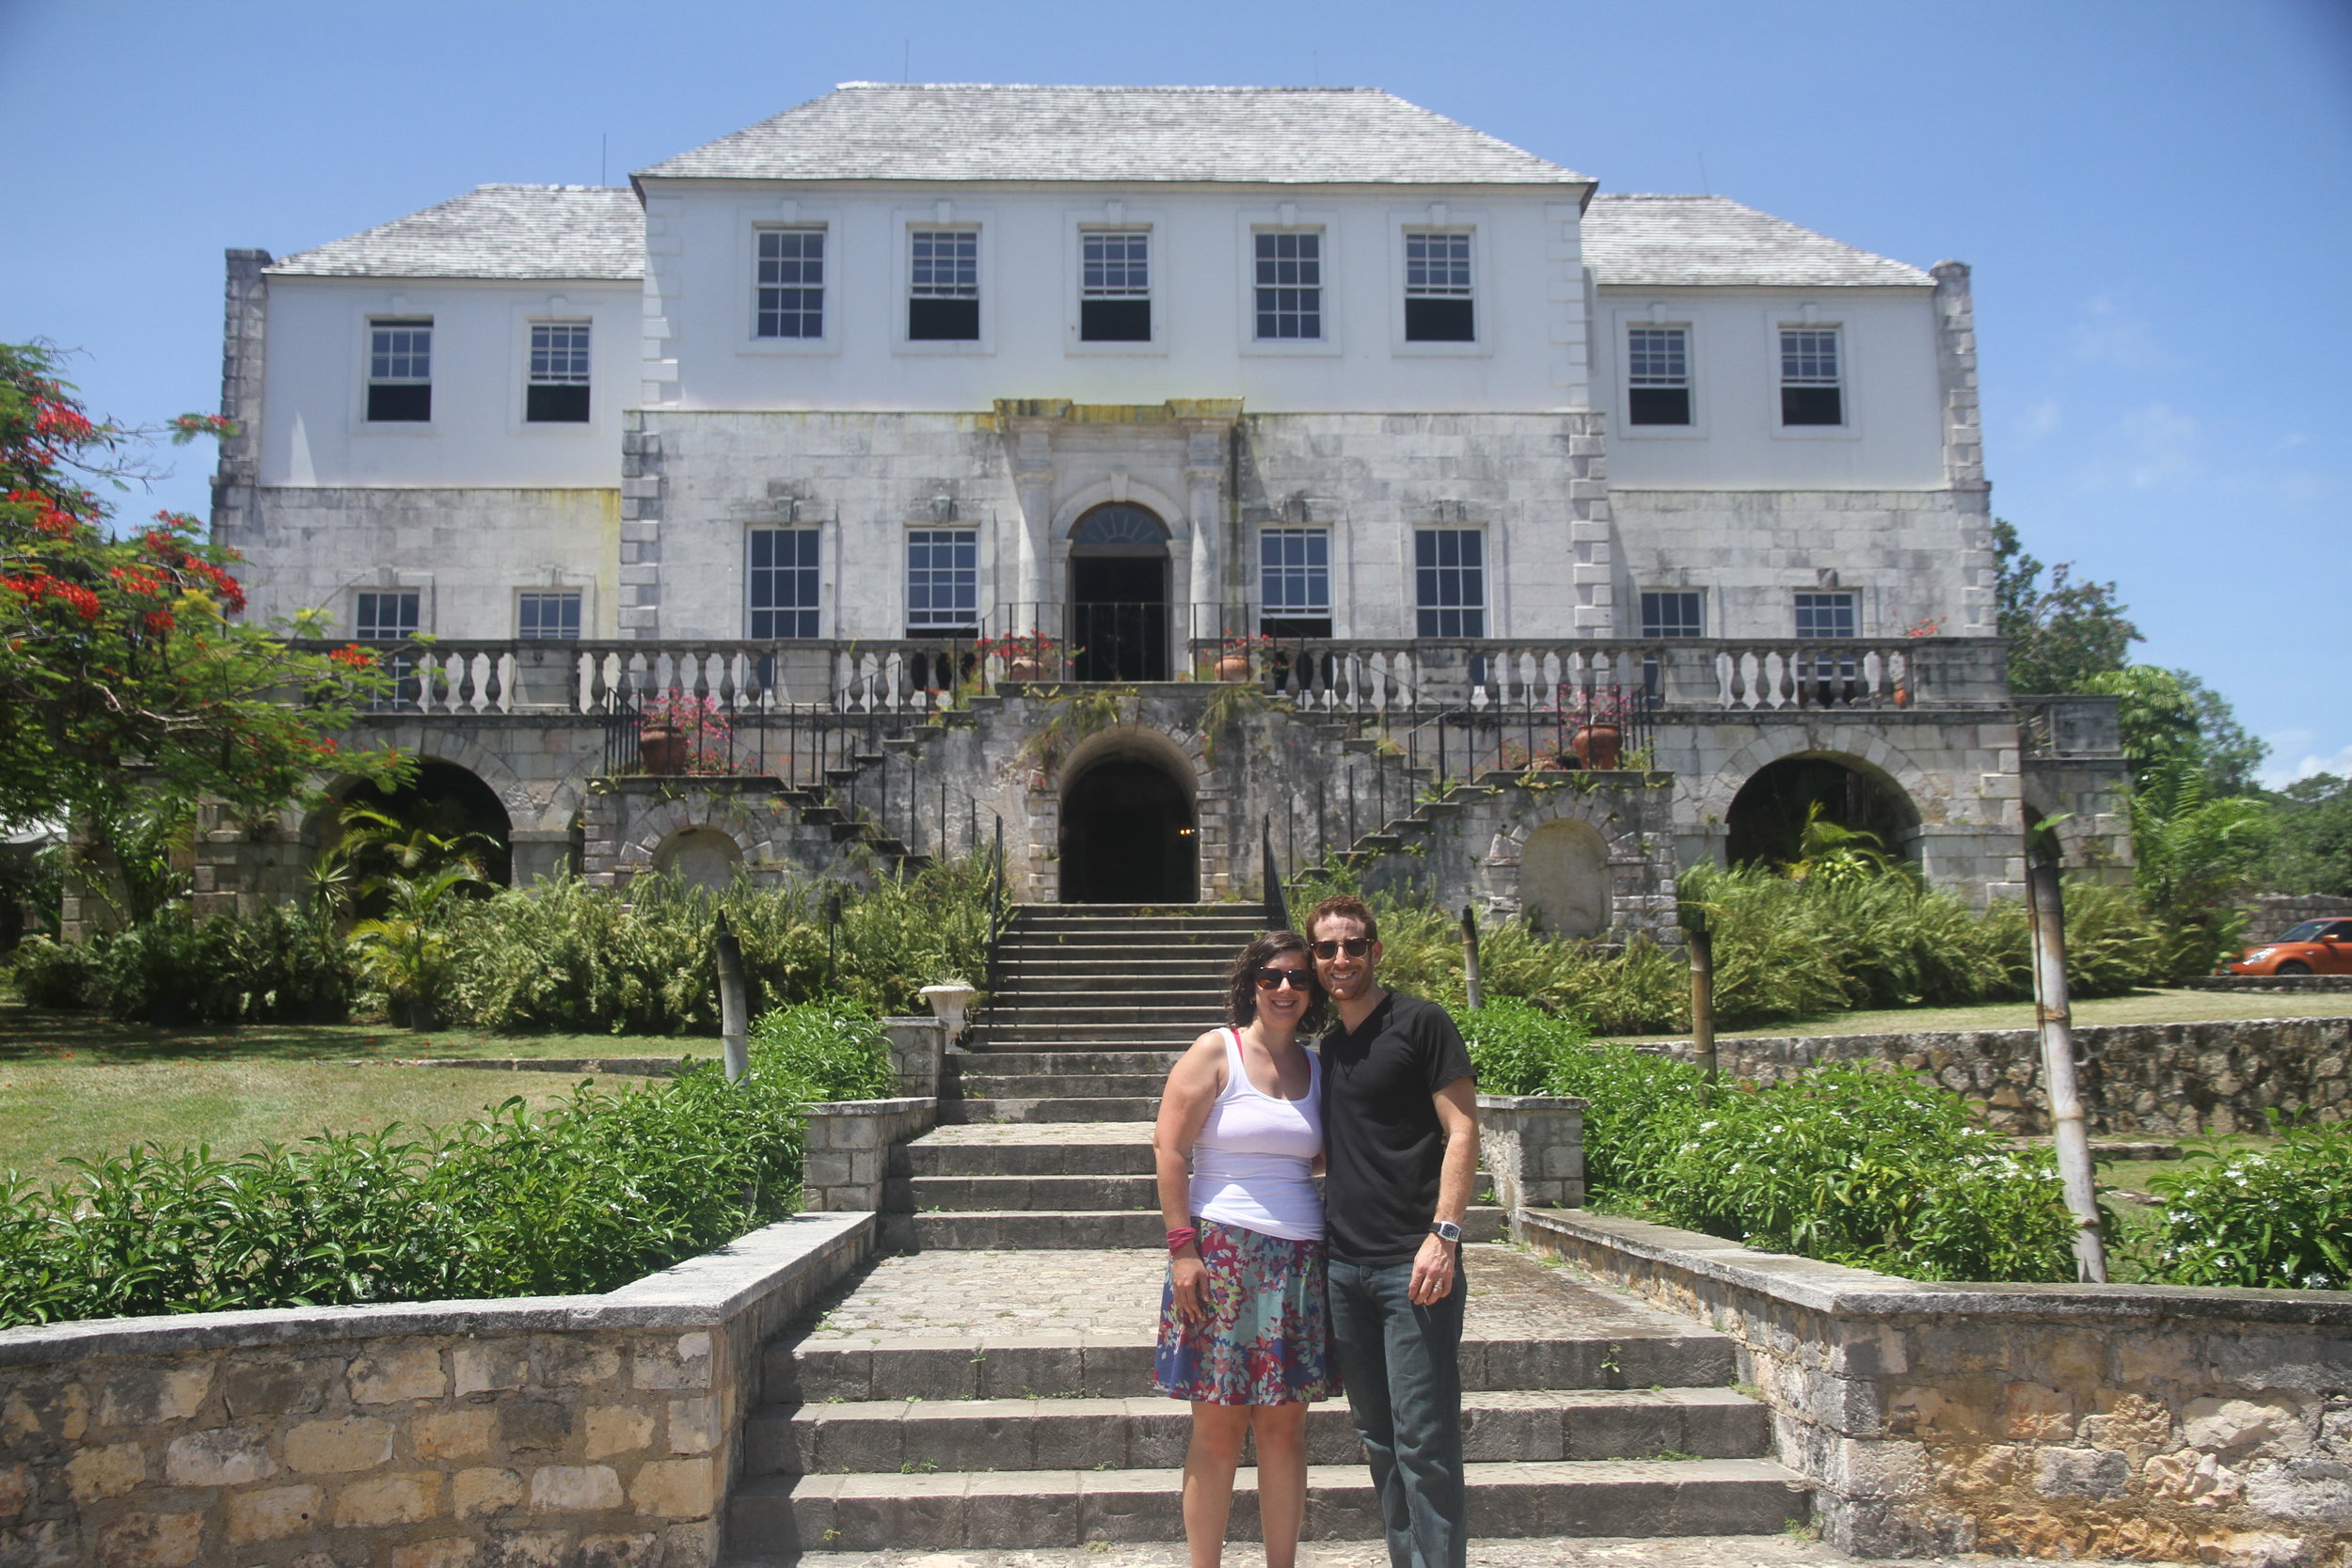 ROSE HALLGREAT HOUSE -